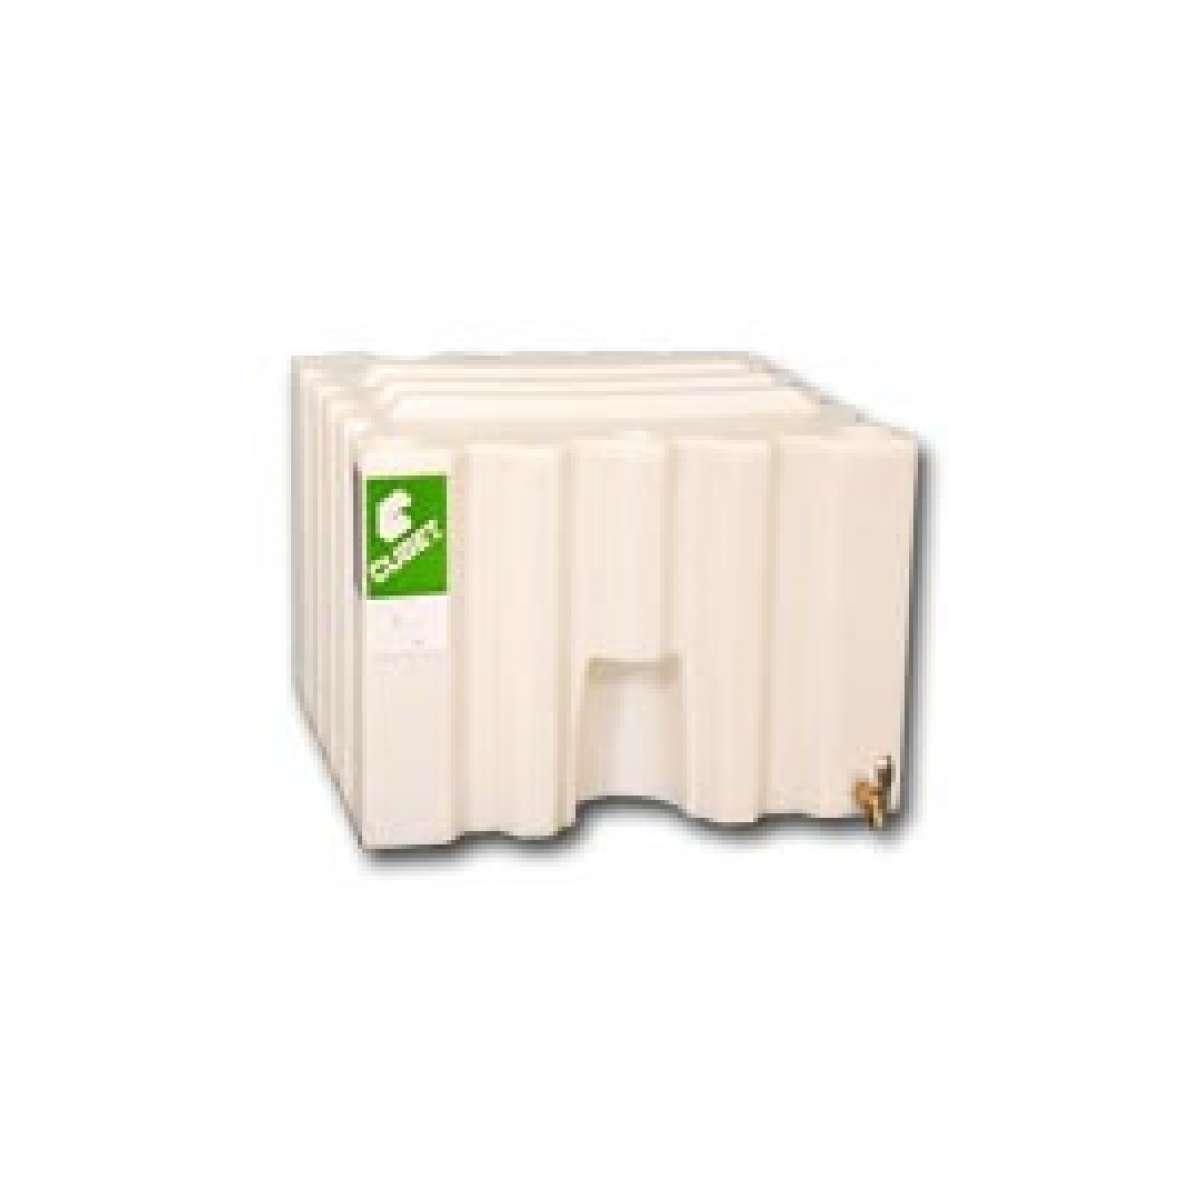 70 Gallon (265 L) Poly Container